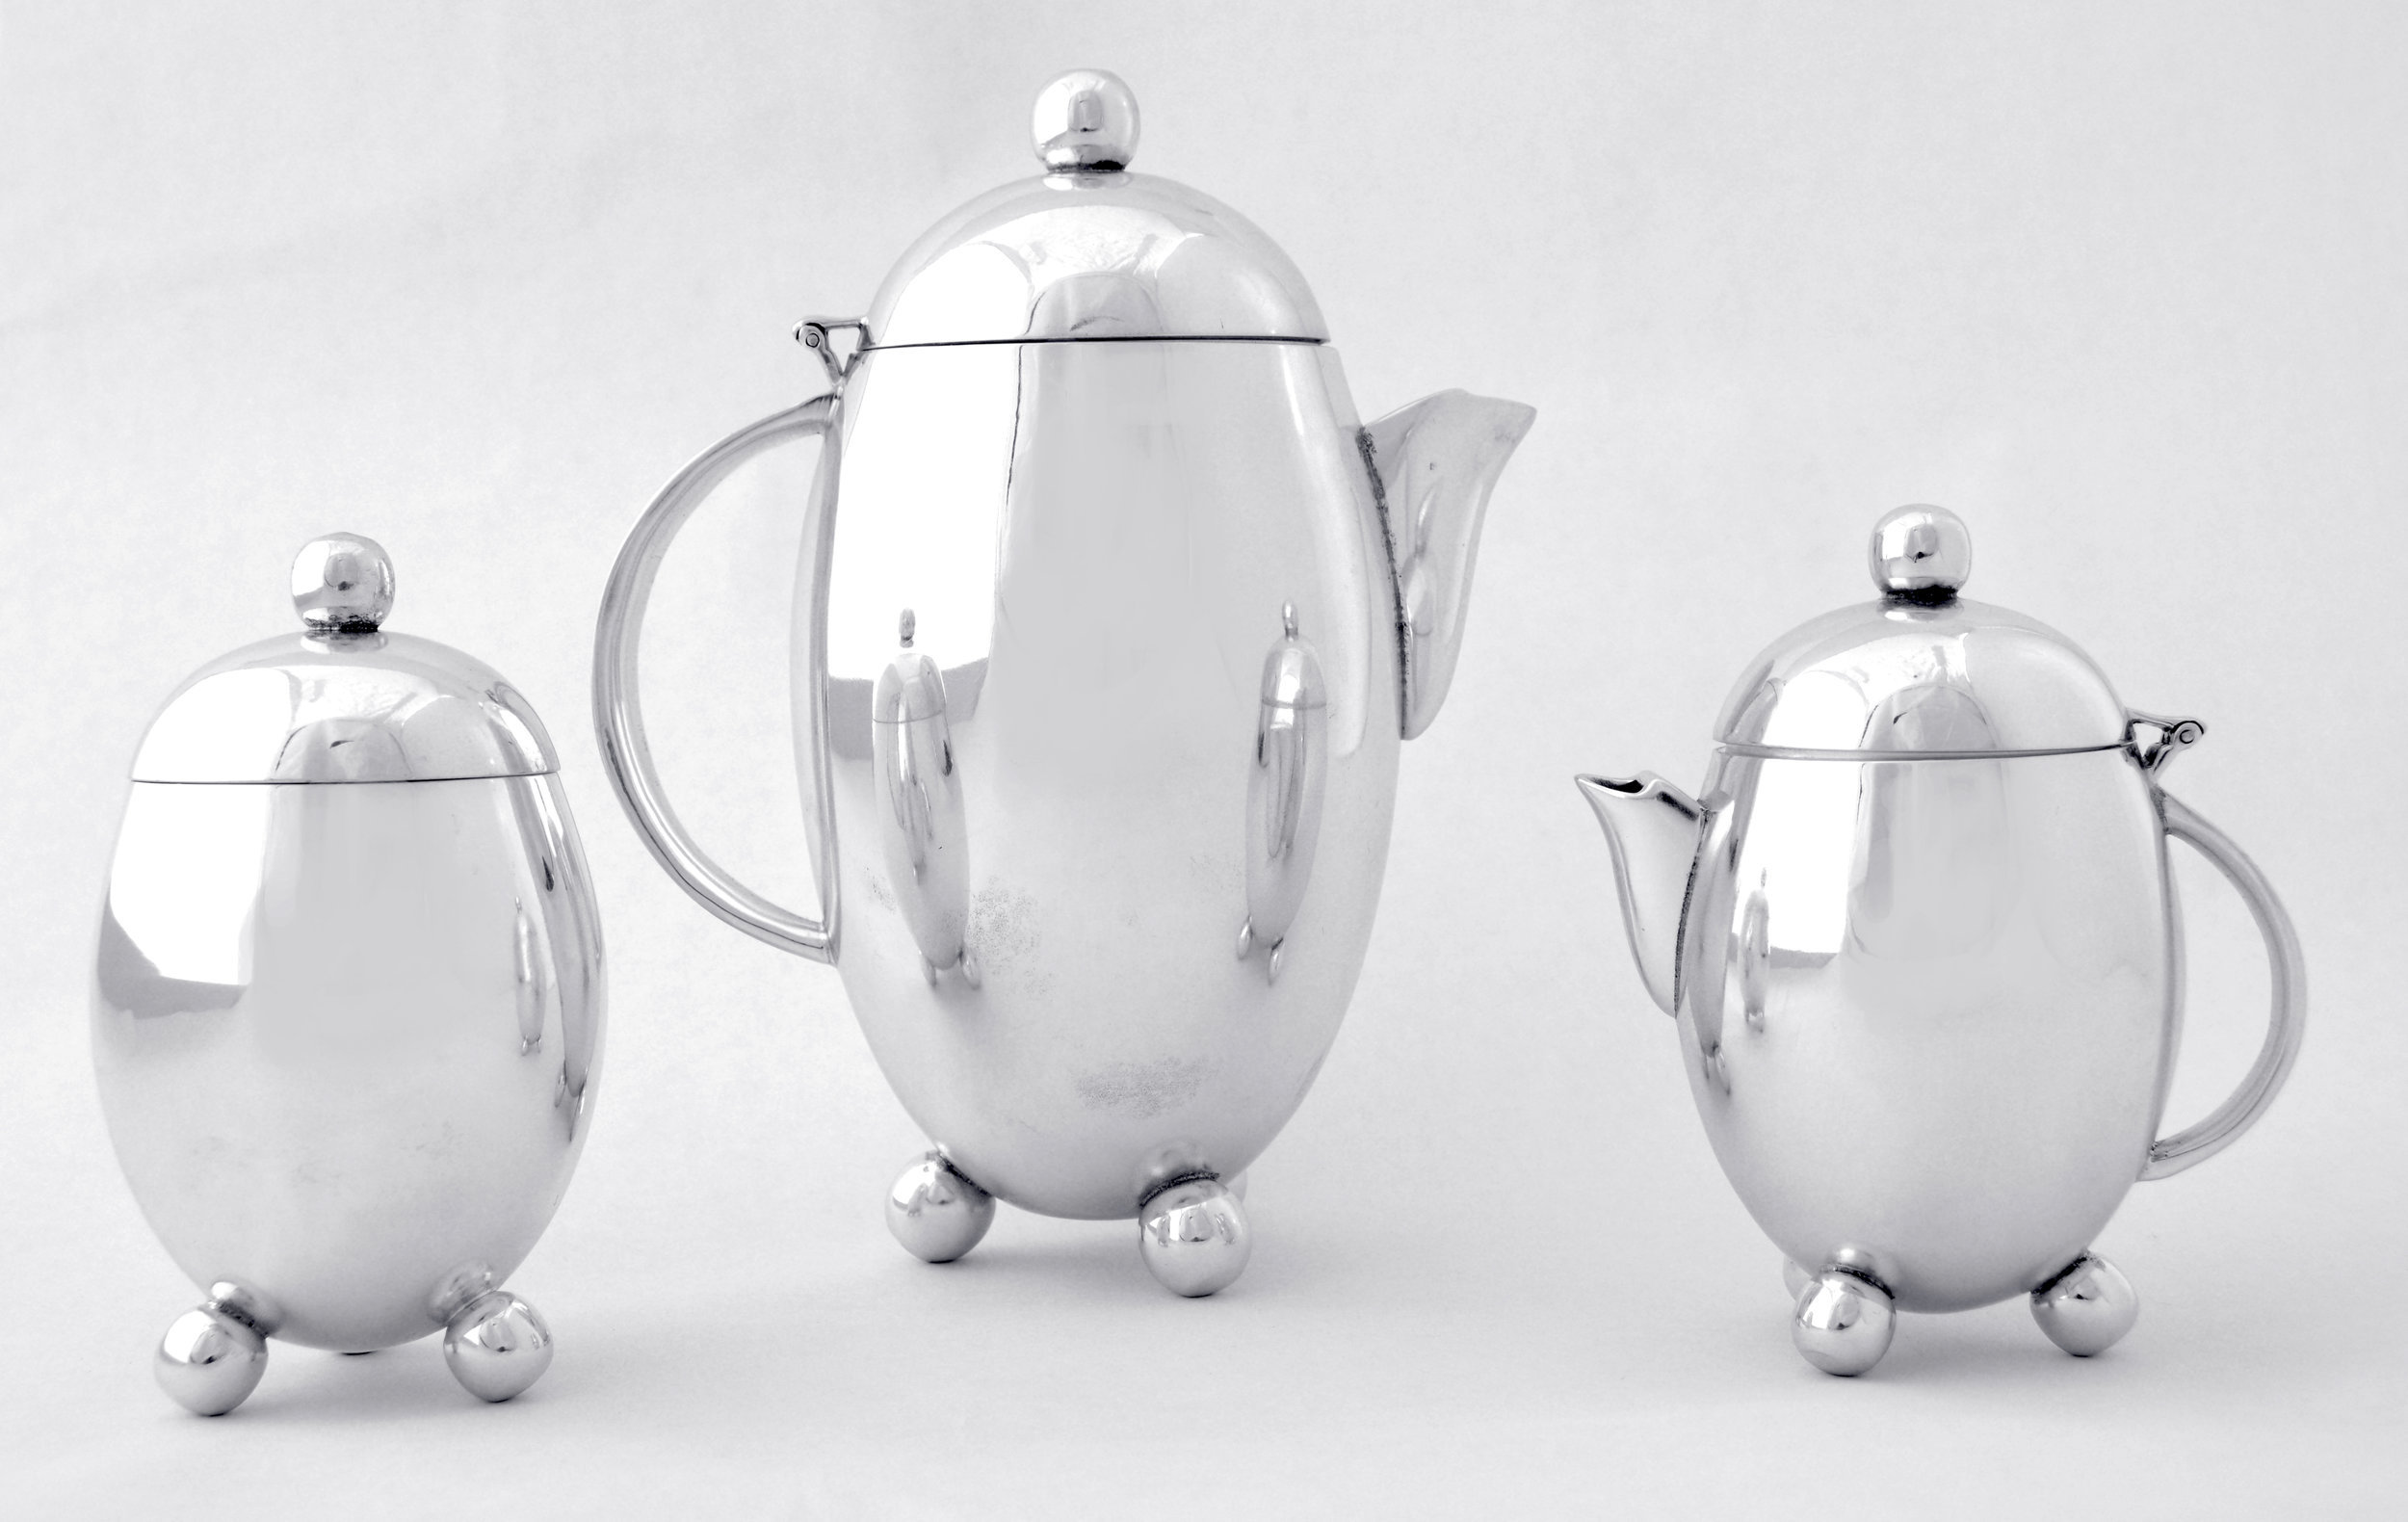 Elephant Approved™ Silver Tea Set